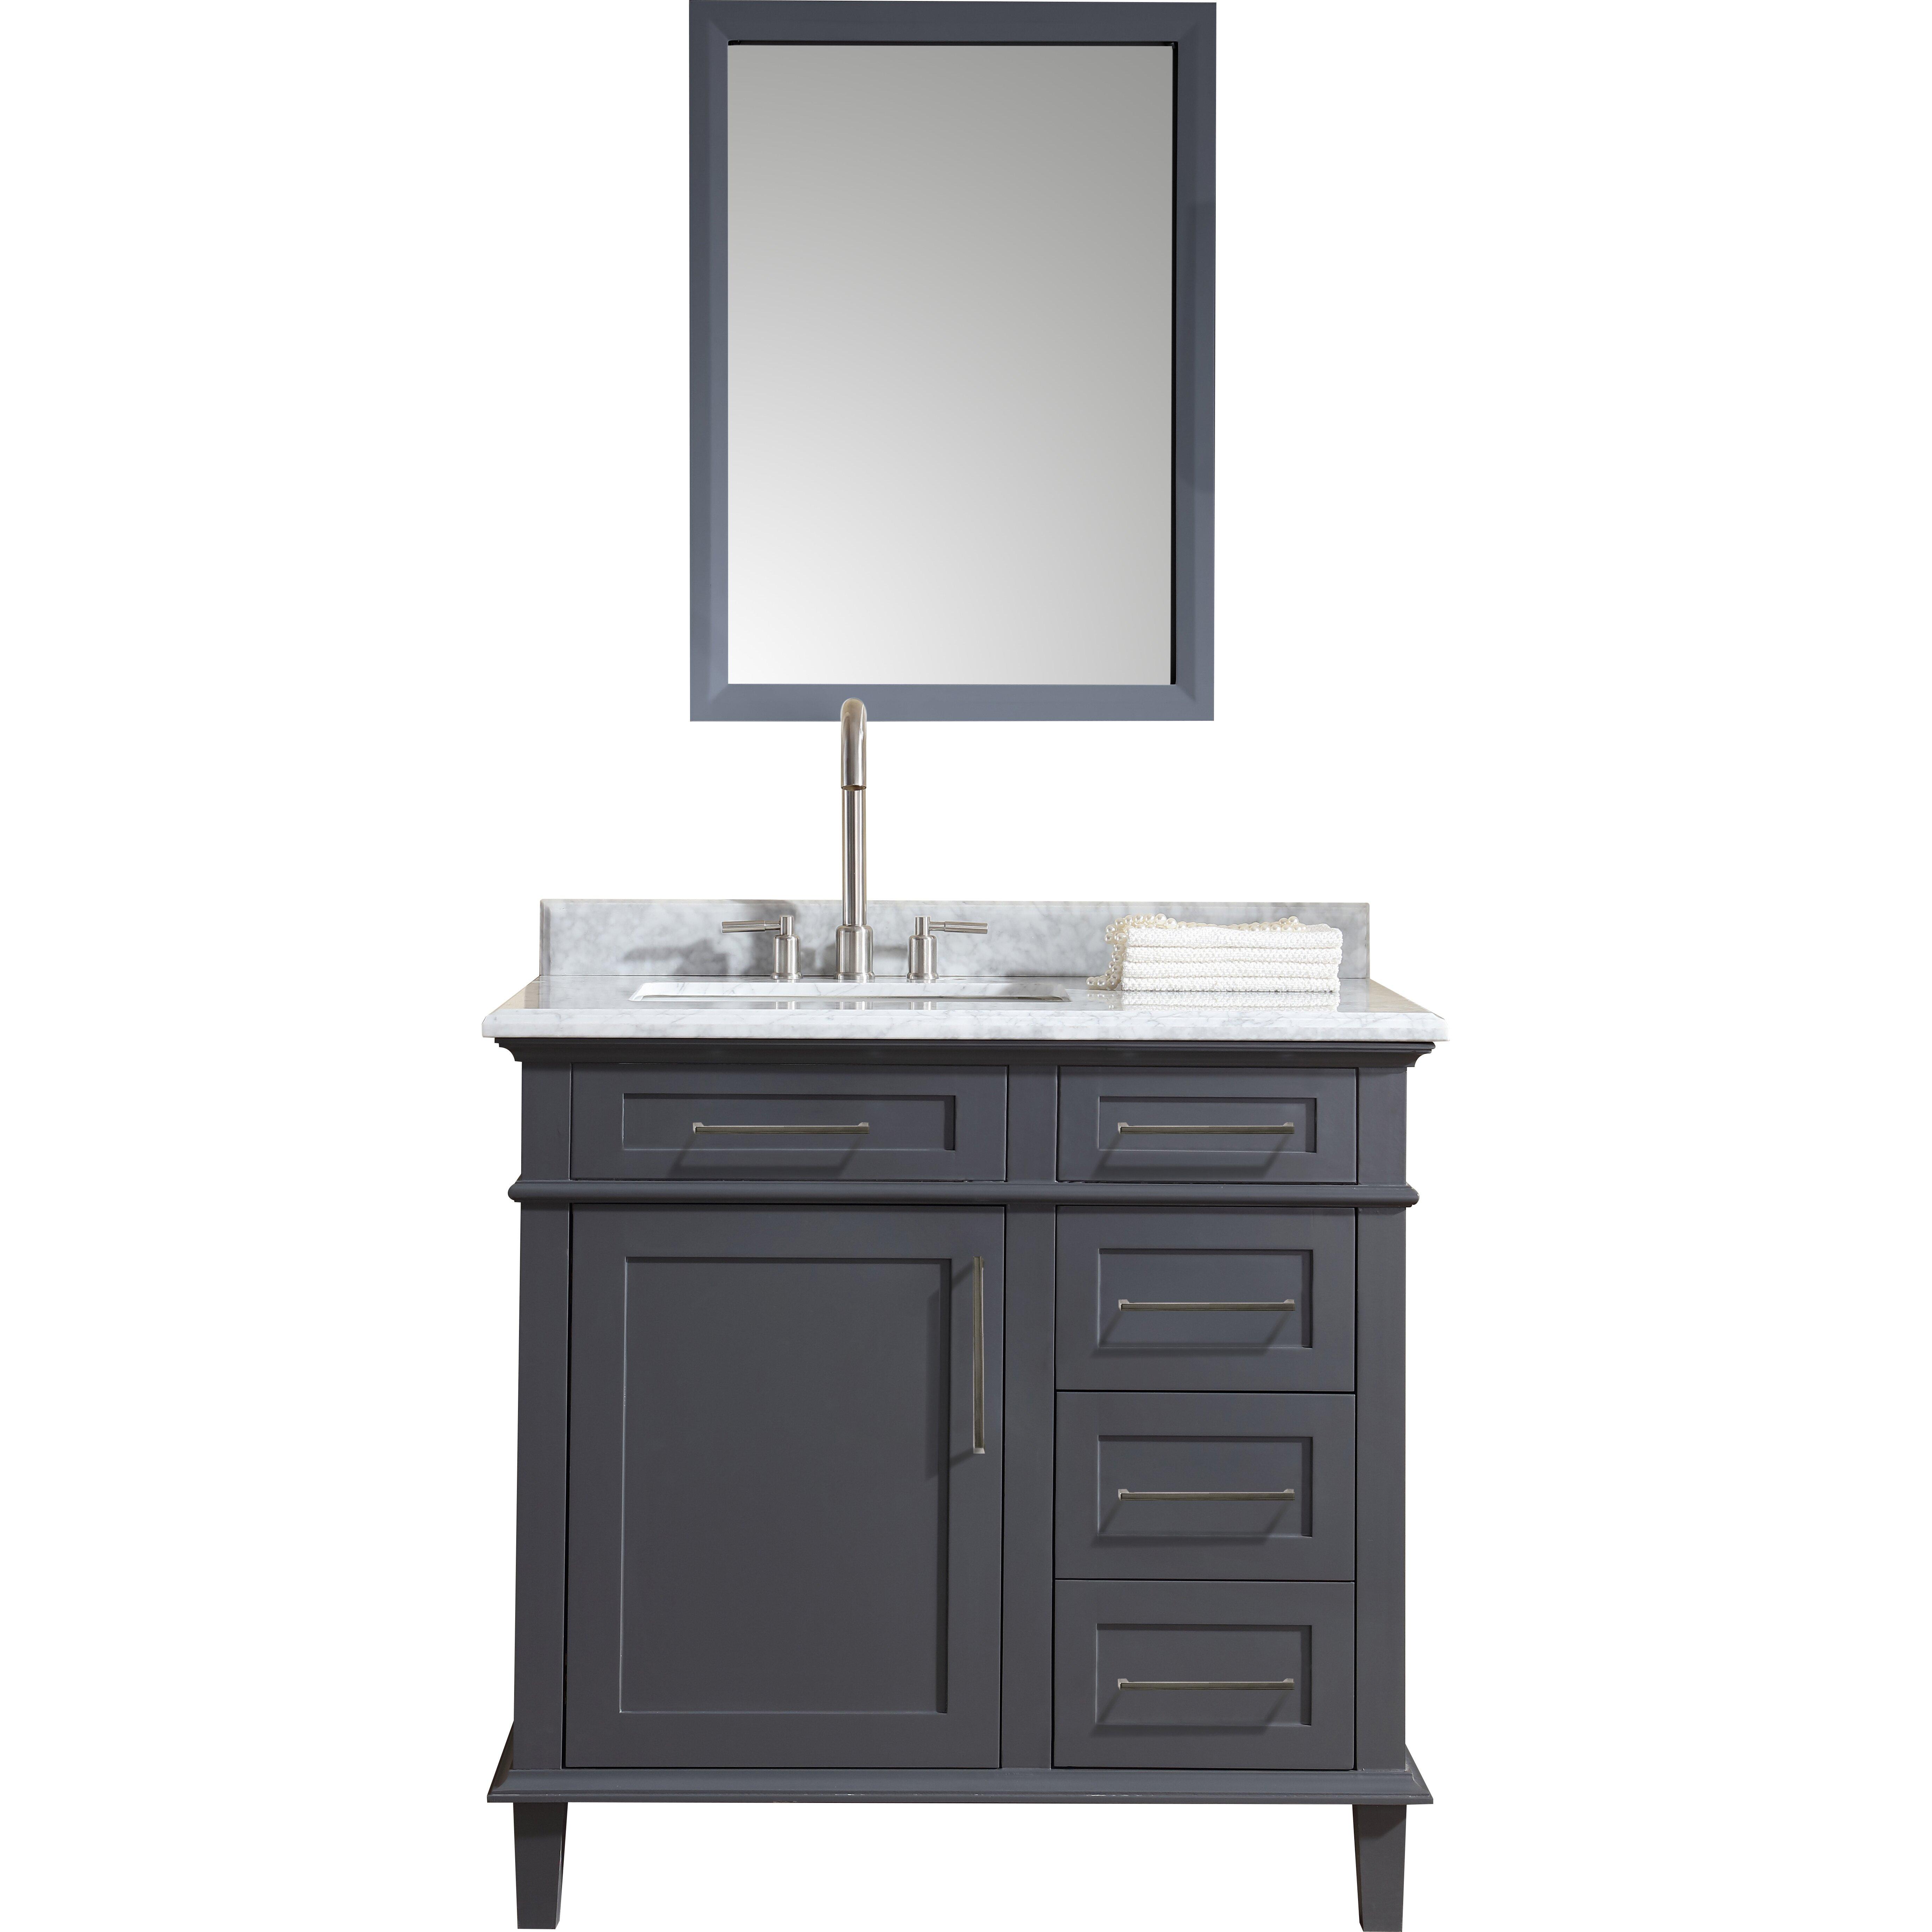 "ari kitchen & bath newport 36"" single bathroom vanity set"